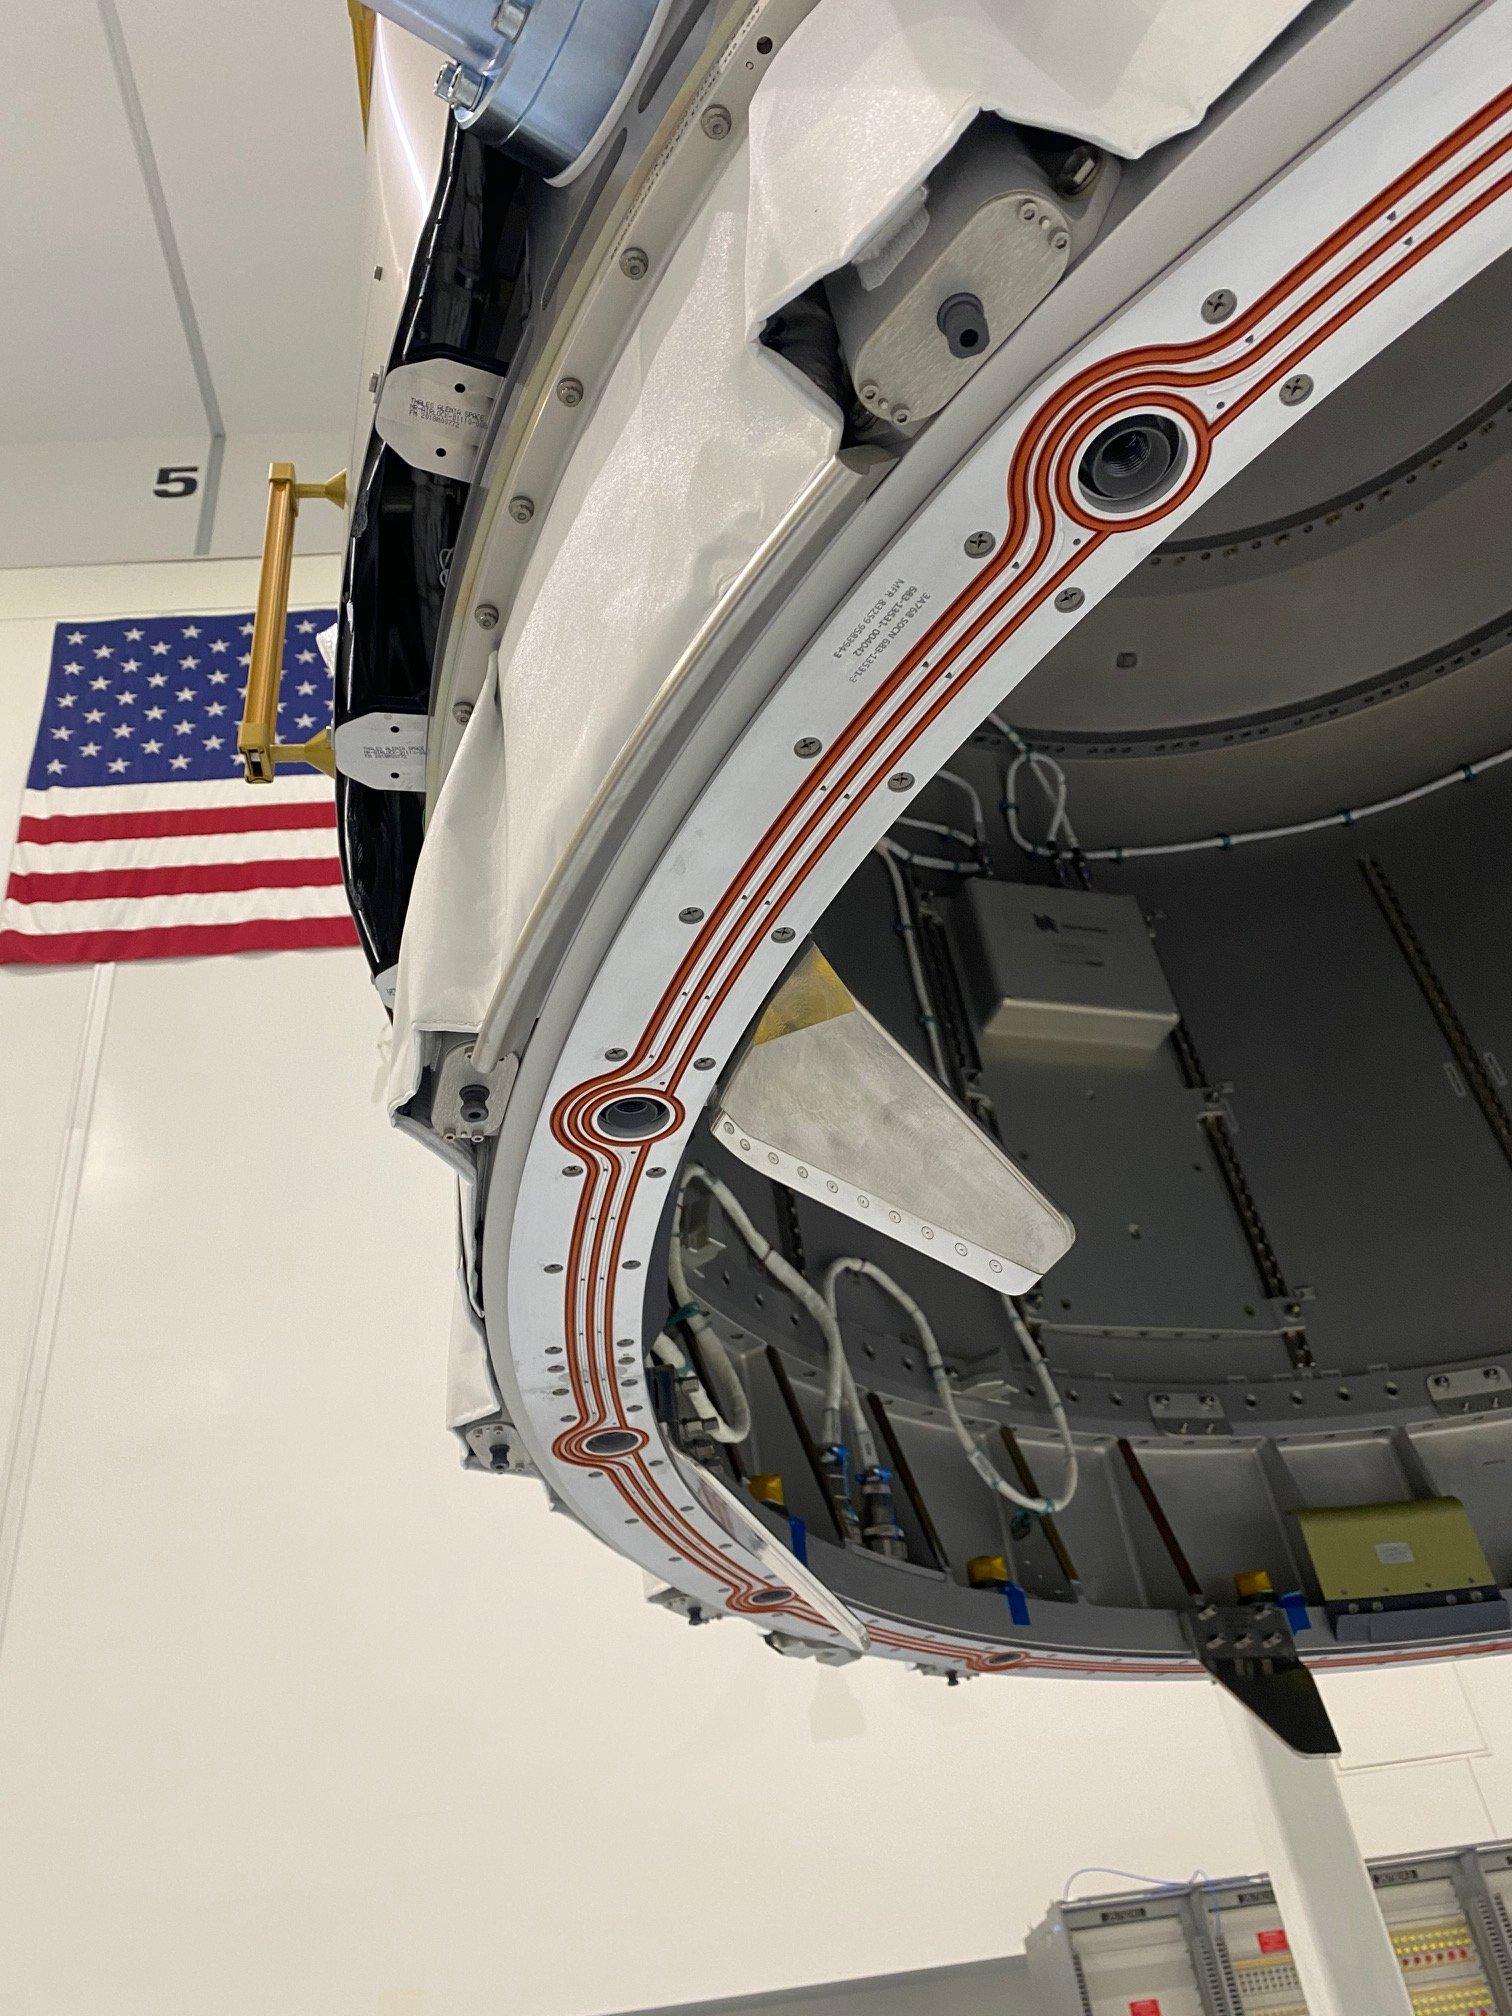 Nanoracks : installation du sas commercial Bishop sur l'ISS 2388